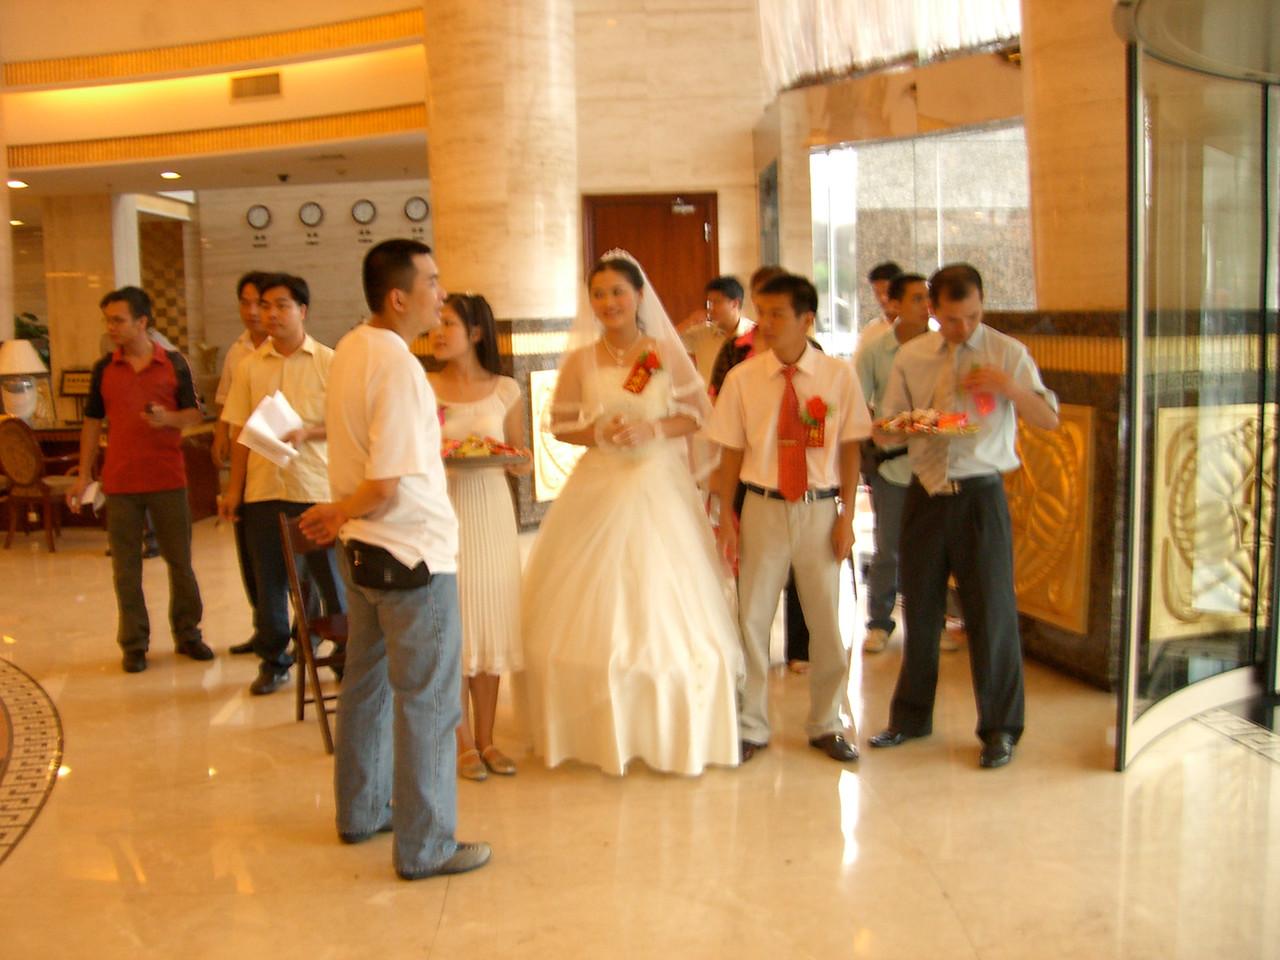 2006 07 15 Sat - Random wedding in Yong Jiang Hotel